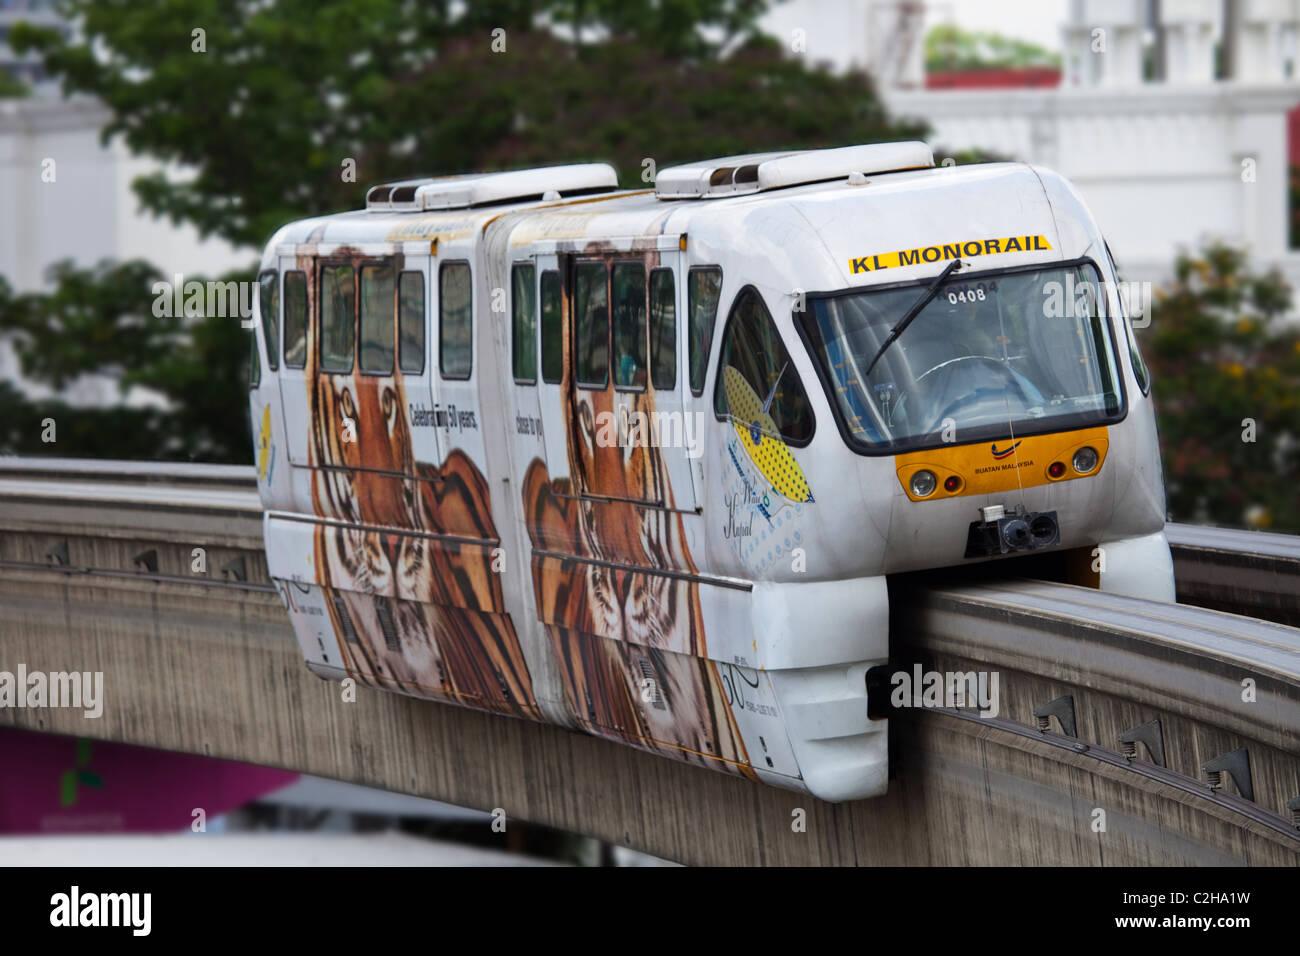 KL Monorail, Kuala Lumpur - Stock Image